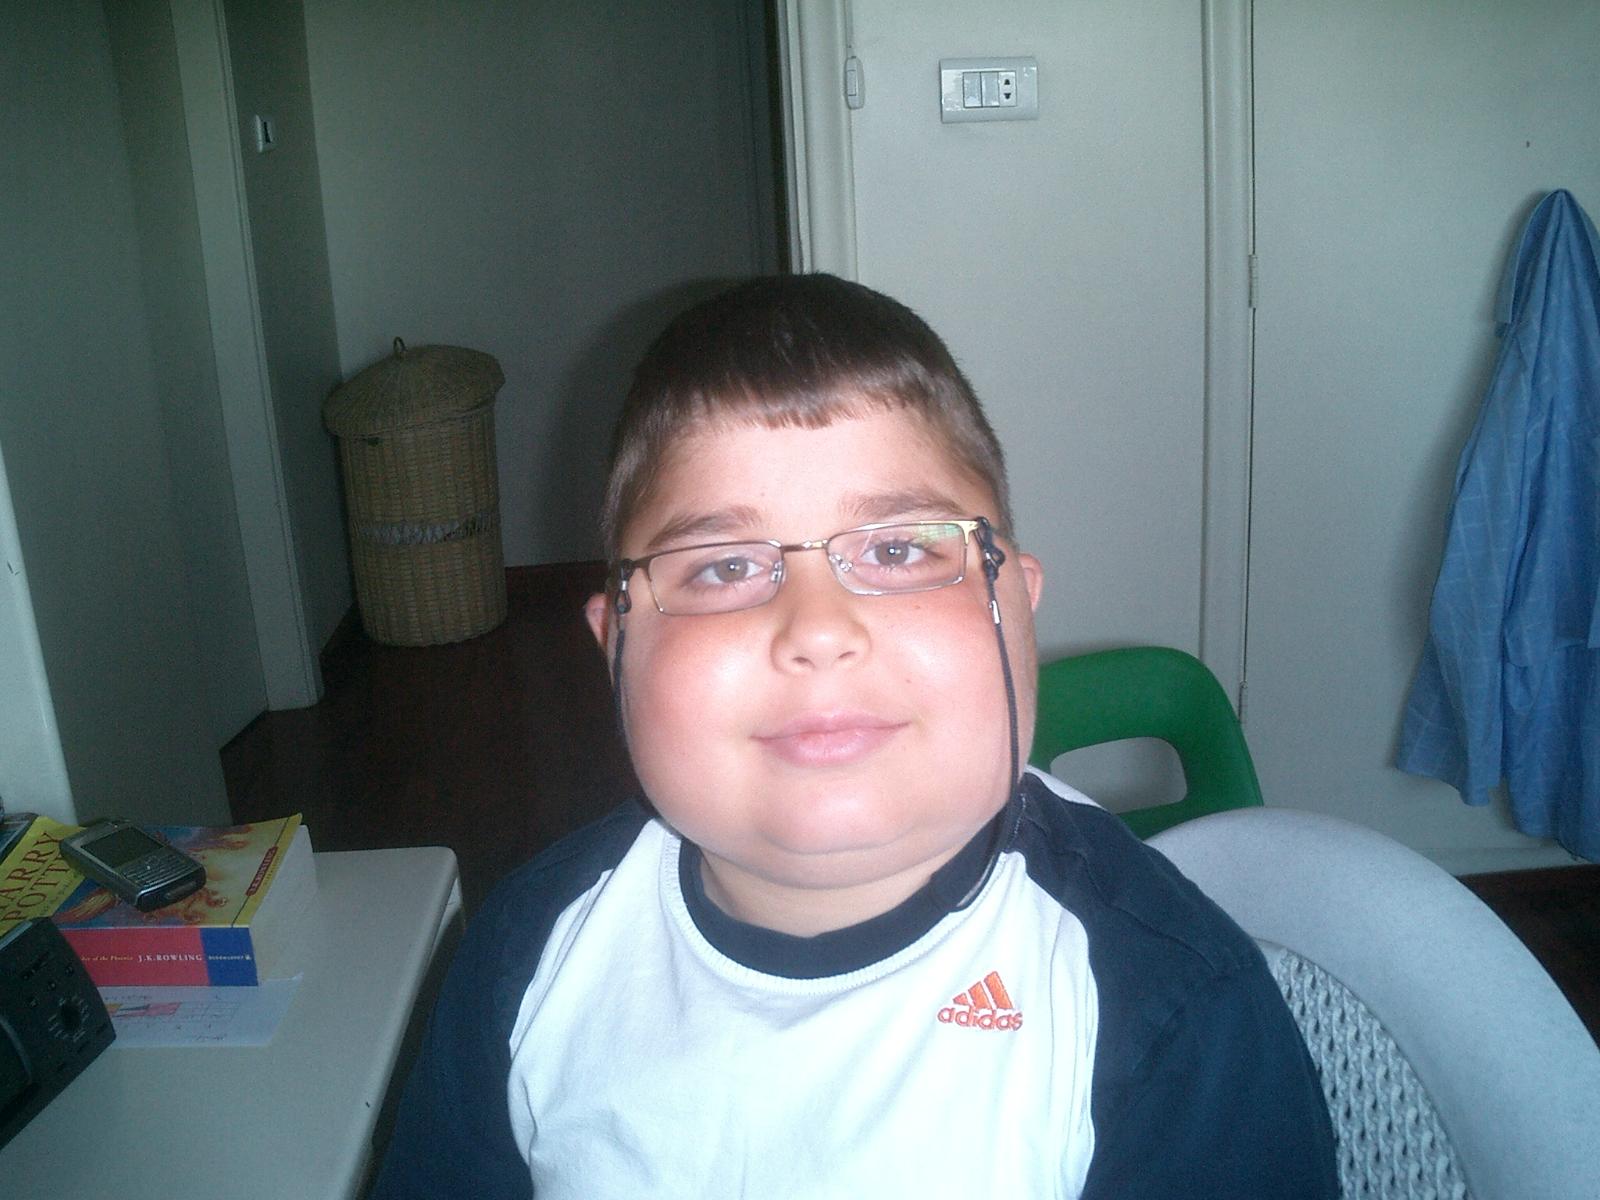 Age 11 after taking medicine